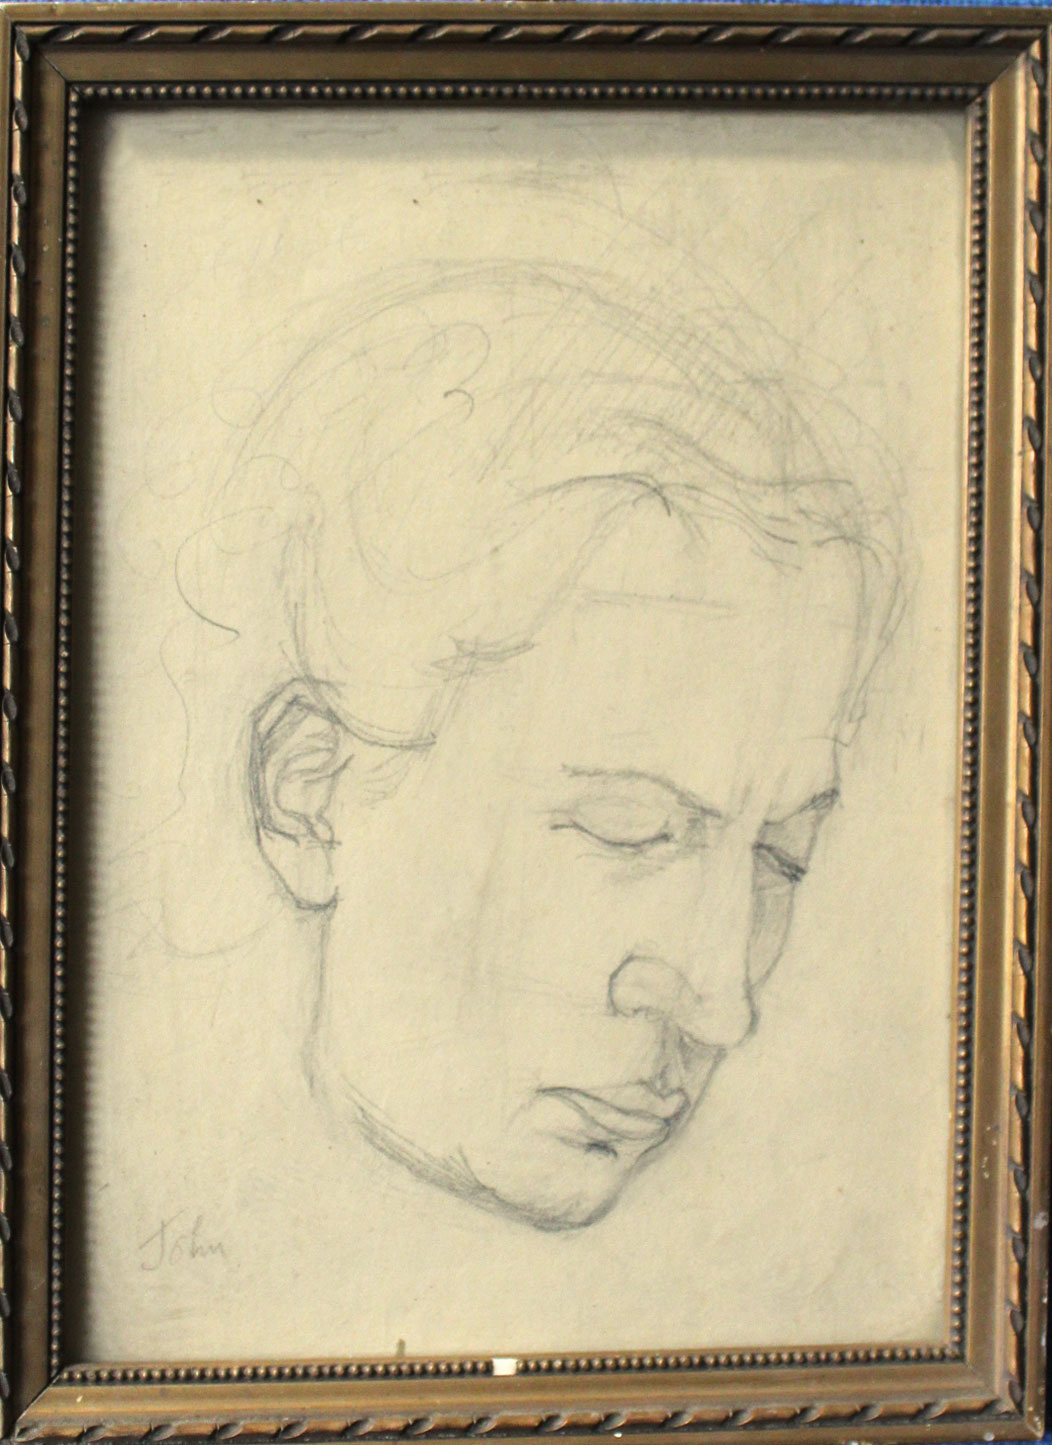 Circle of Augustus John, Head study, pencil drawing, bears signature lower left, 22 x 16cm